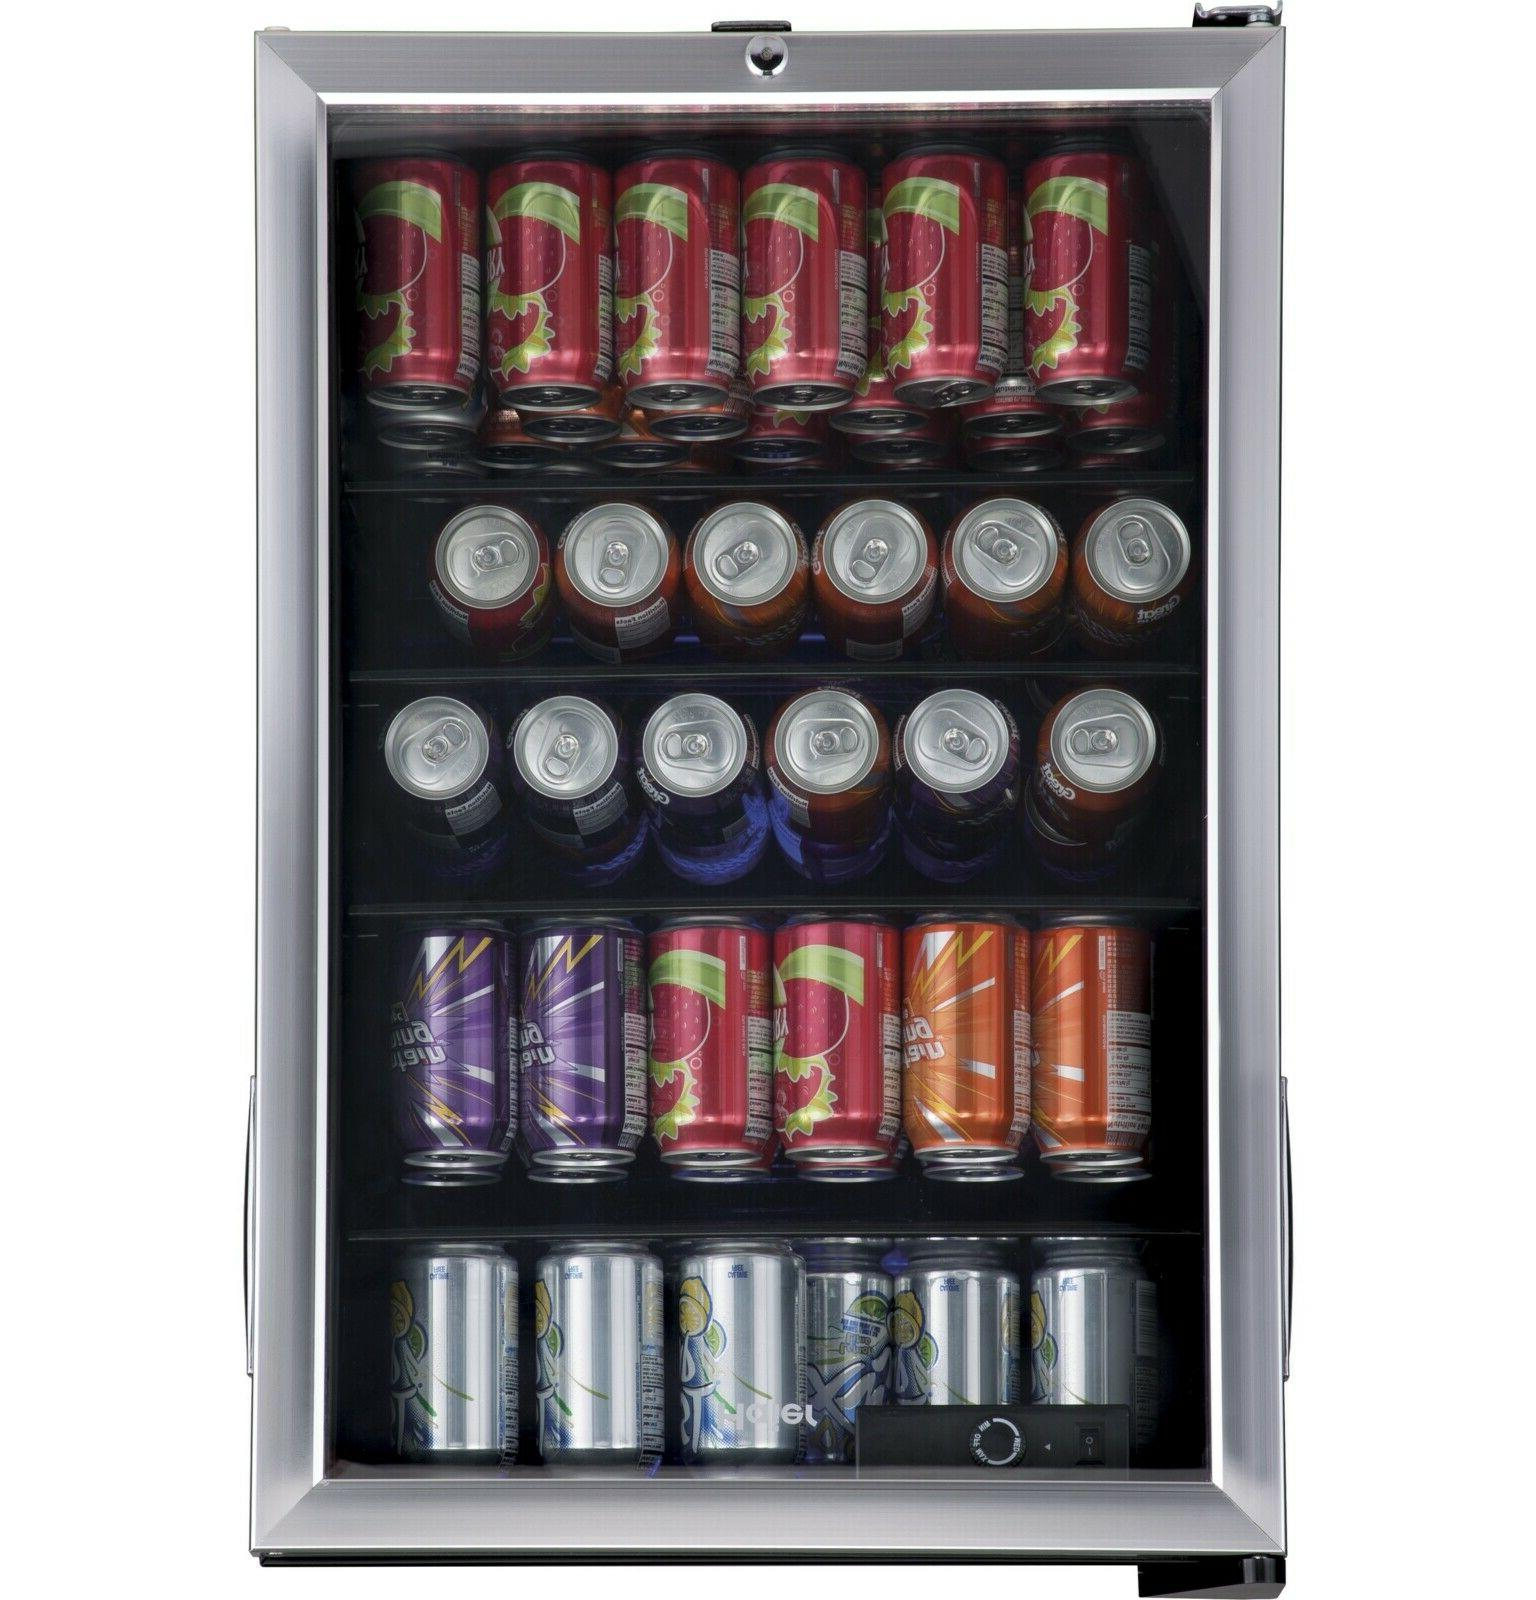 beverage cooler refrigerator 150 can mini fridge